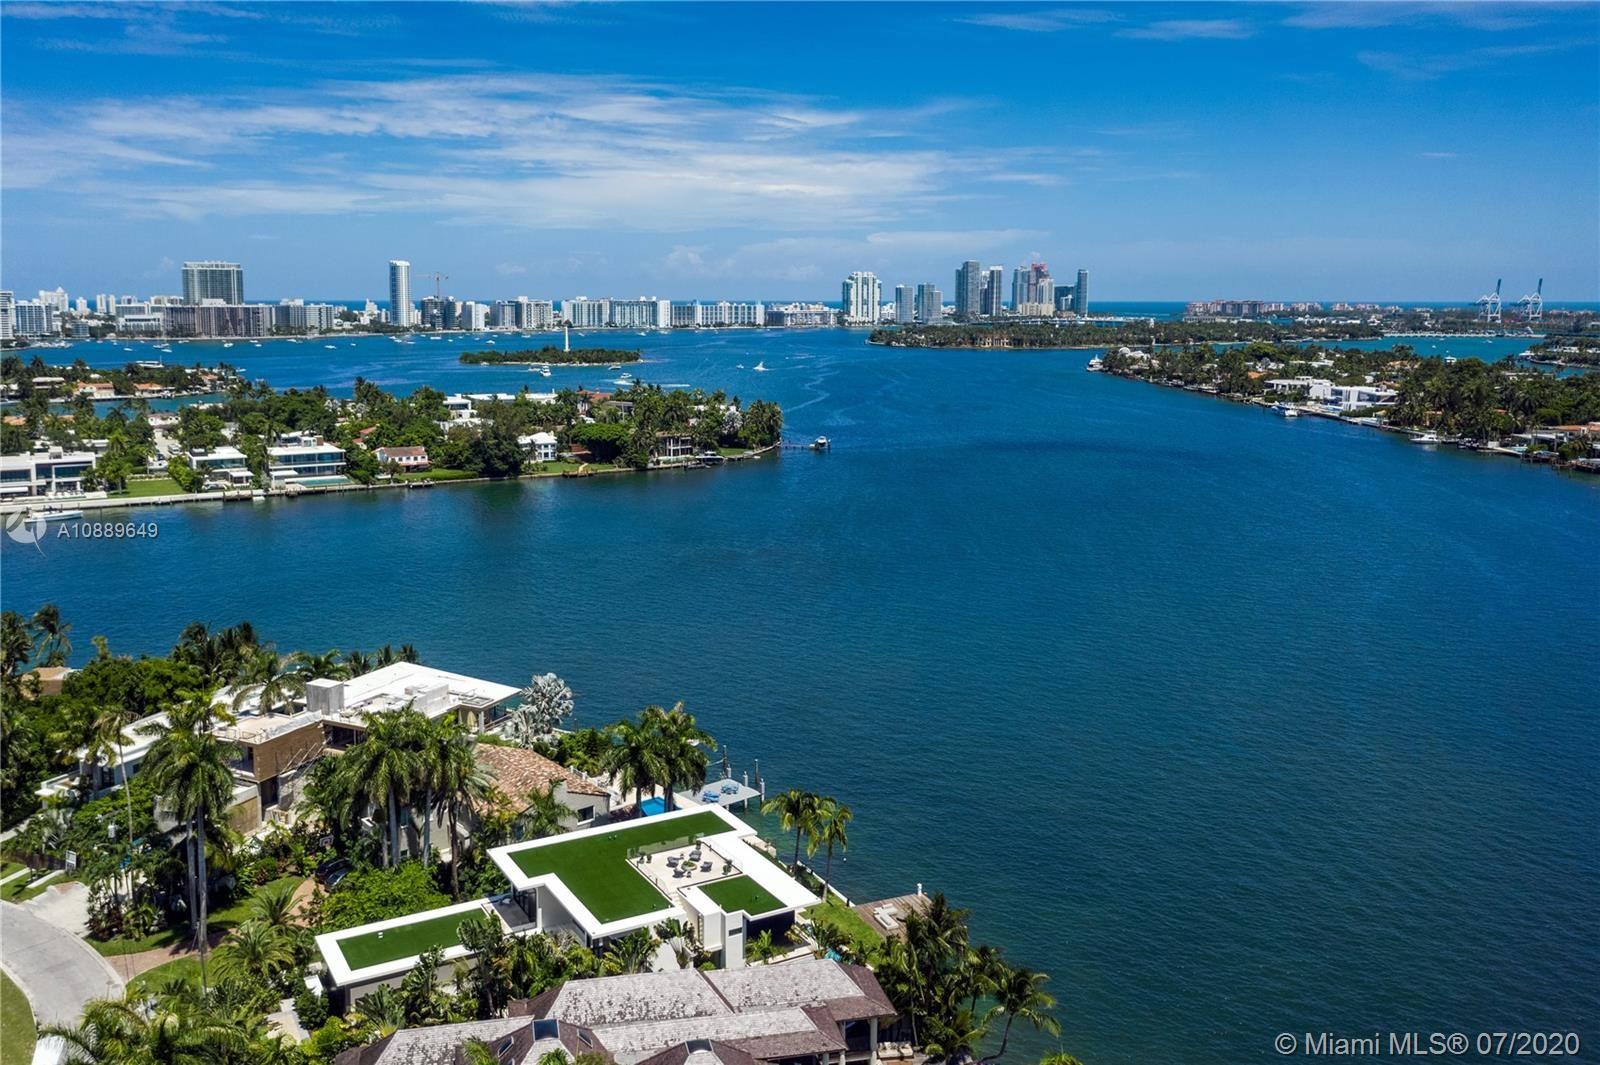 Photo 71 of Listing MLS a10889649 in 10 W San Marino Dr Miami Beach FL 33139